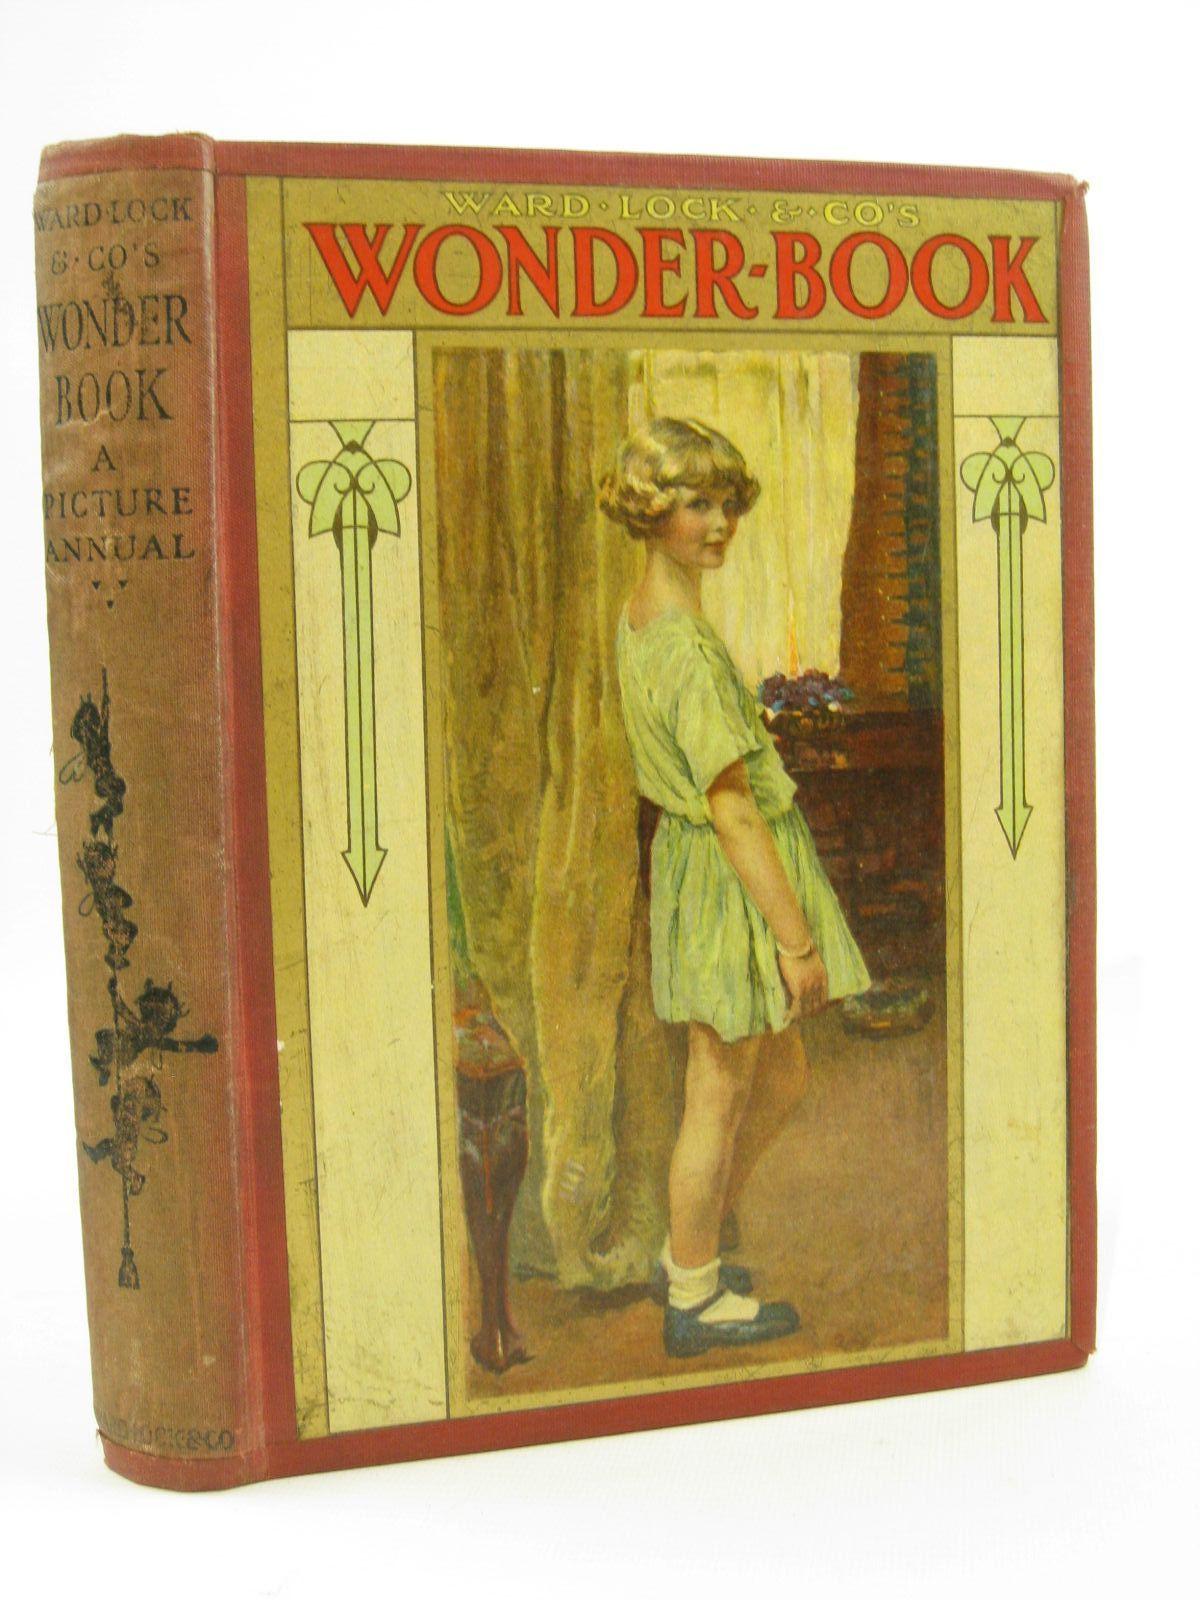 Photo of WARD LOCK &AMP; CO'S WONDER BOOK 1925 written by Golding, Harry<br />Joan, Natalie<br />Rutley, Cecily M.<br />Wynne, May<br />Chaundler, Christine<br />et al,  illustrated by Anderson, Anne<br />Brisley, Nina K.<br />Tarrant, Margaret<br />Aris, Ernest A.<br />et al.,  published by Ward Lock &amp; Co Ltd. (STOCK CODE: 1507715)  for sale by Stella & Rose's Books